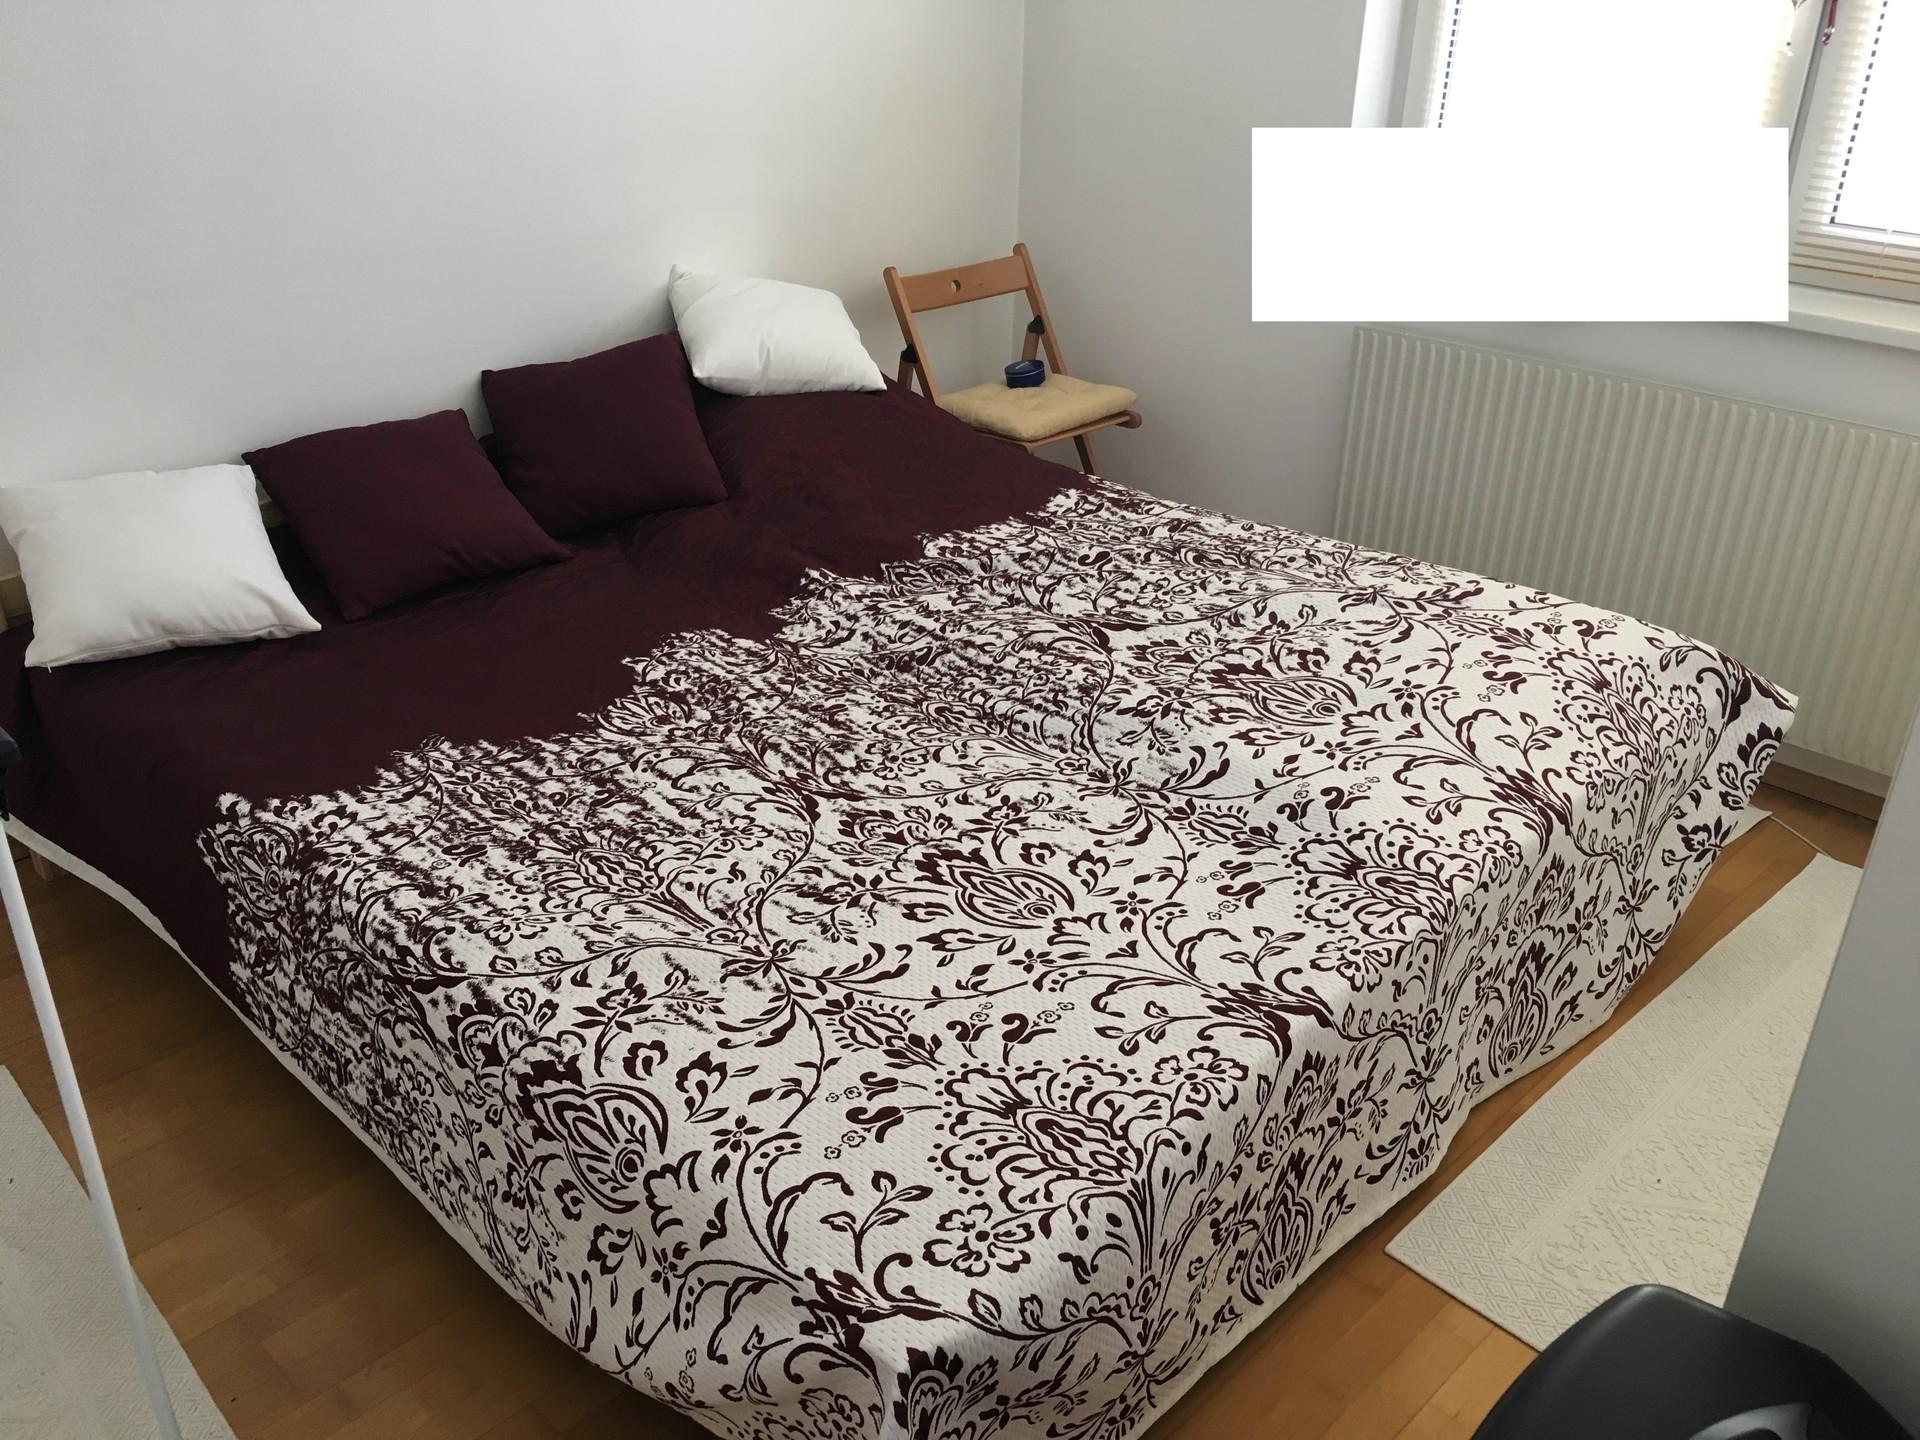 lovely-sunny-quiet-apartment-10-min-historical-center-7e79e518e18f28148ae63db7ef7c45e5